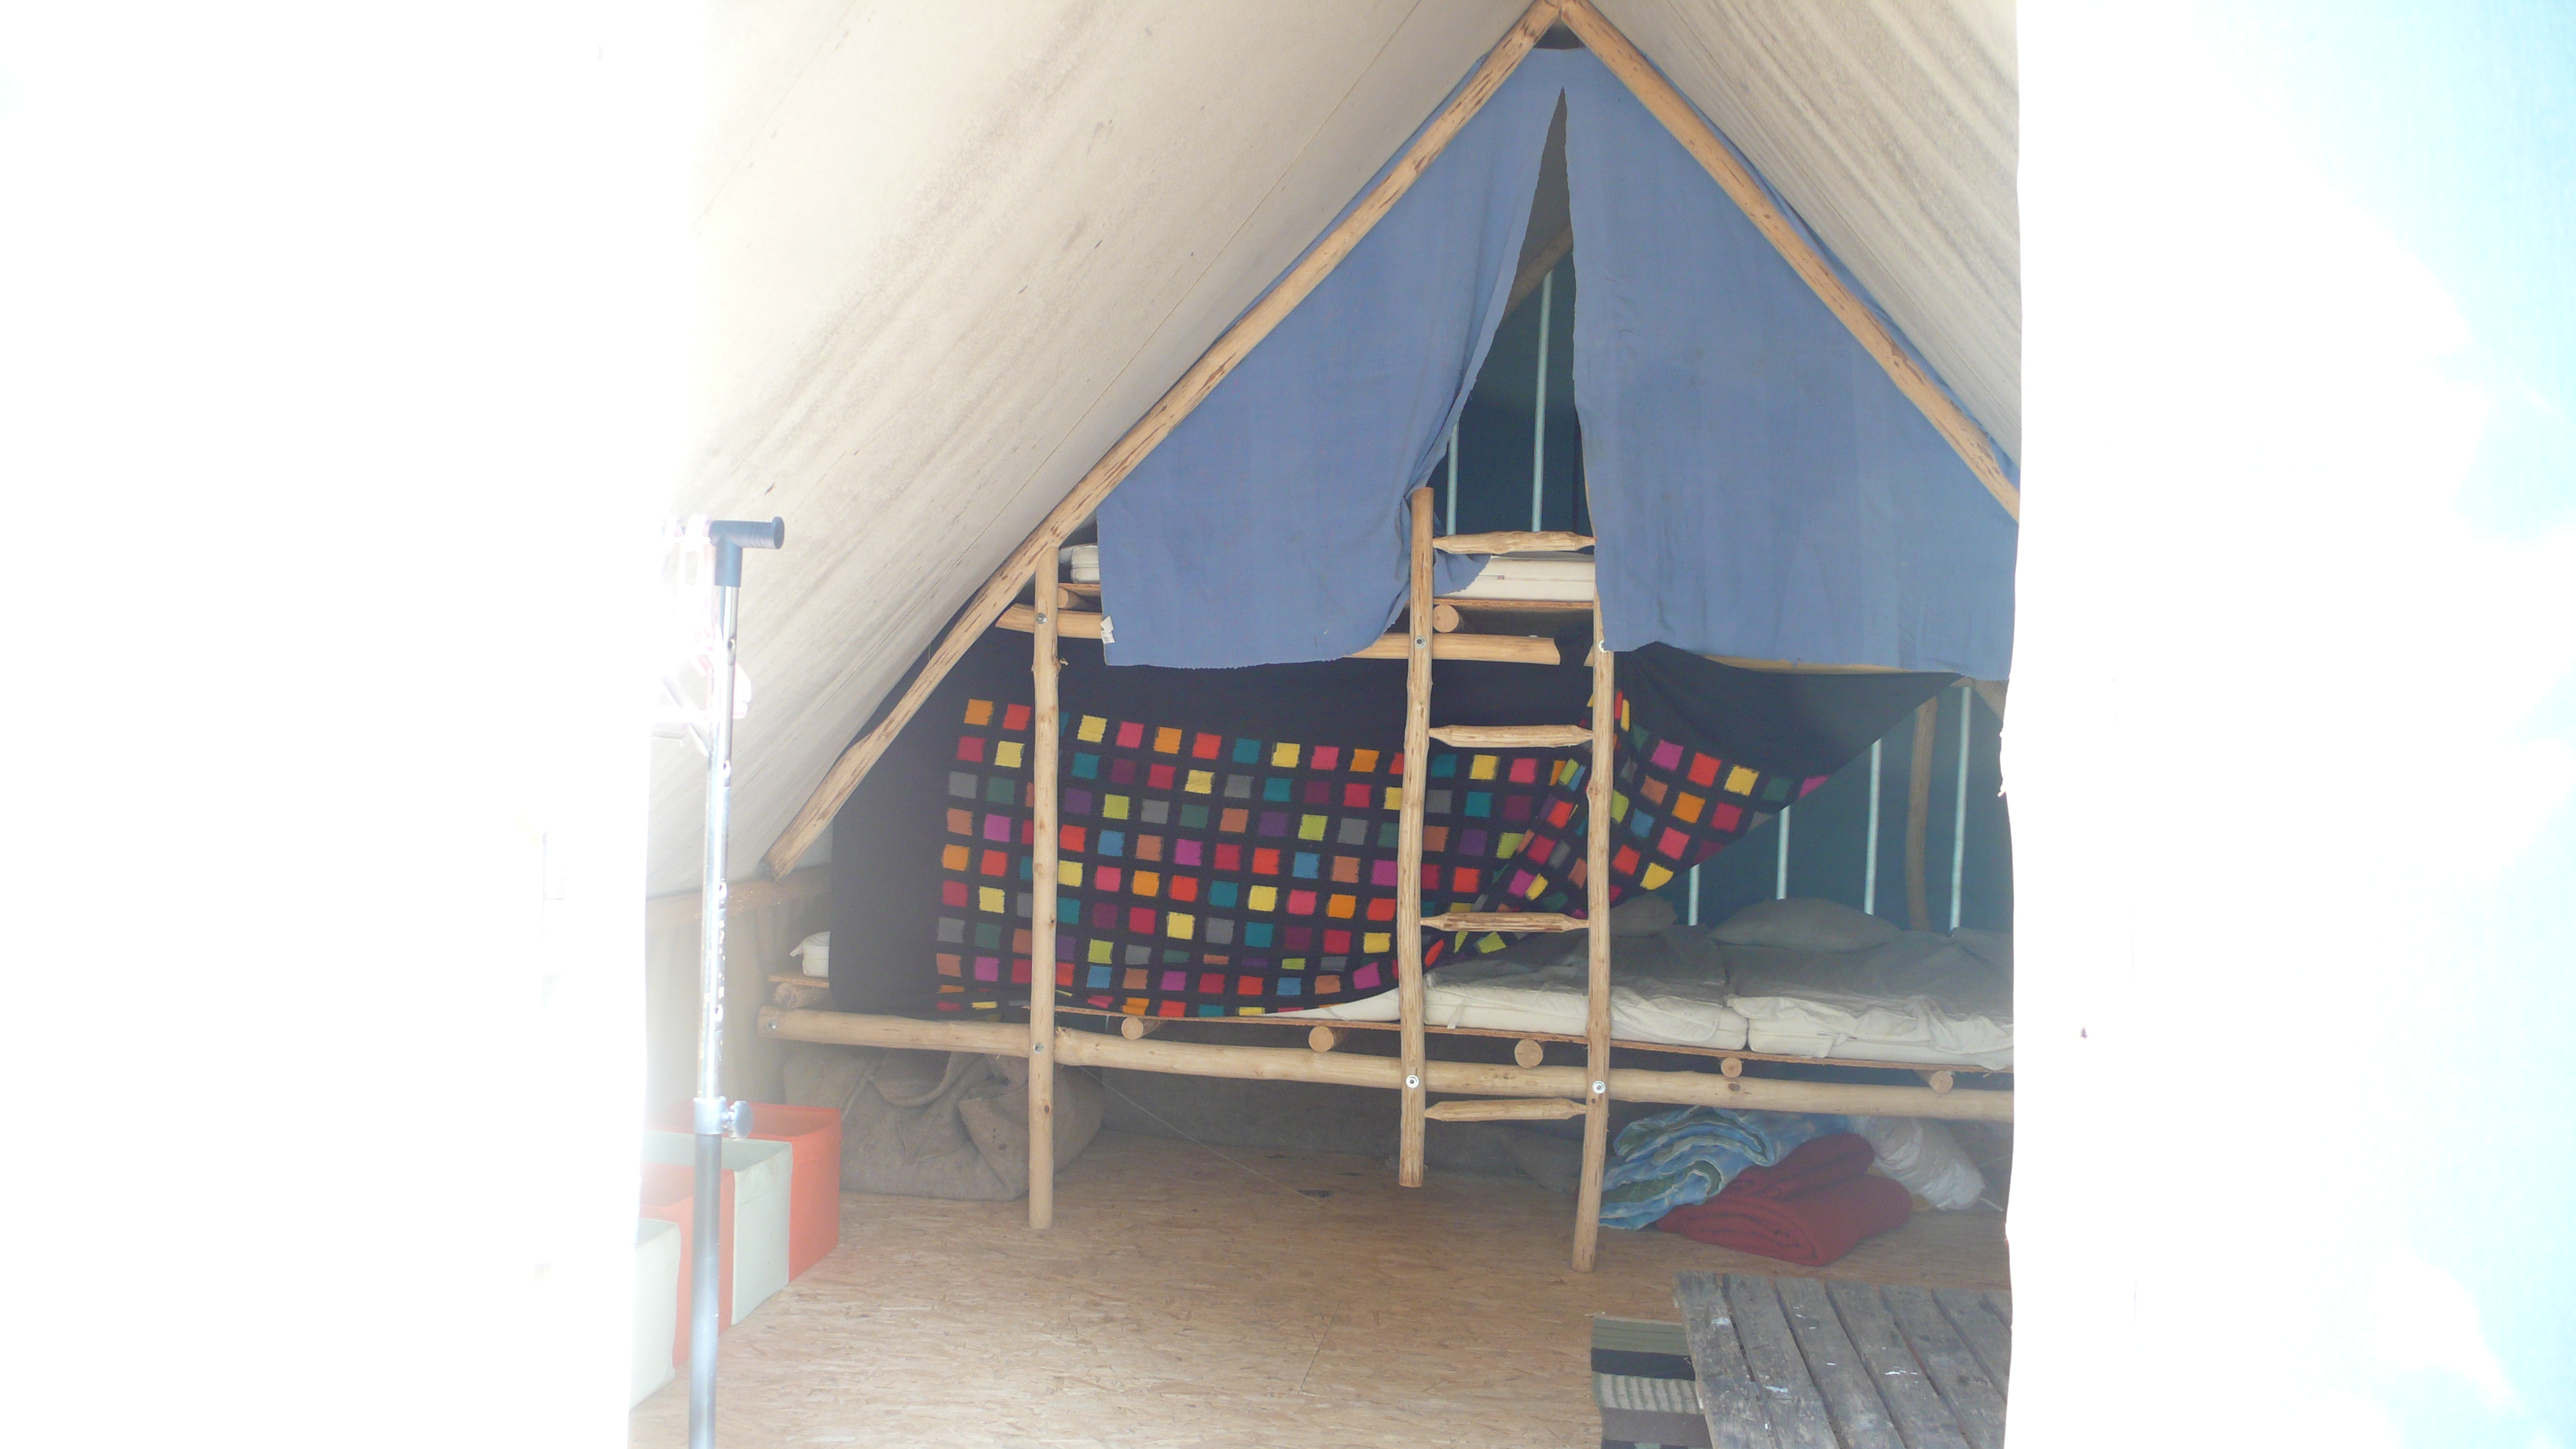 interieur tente